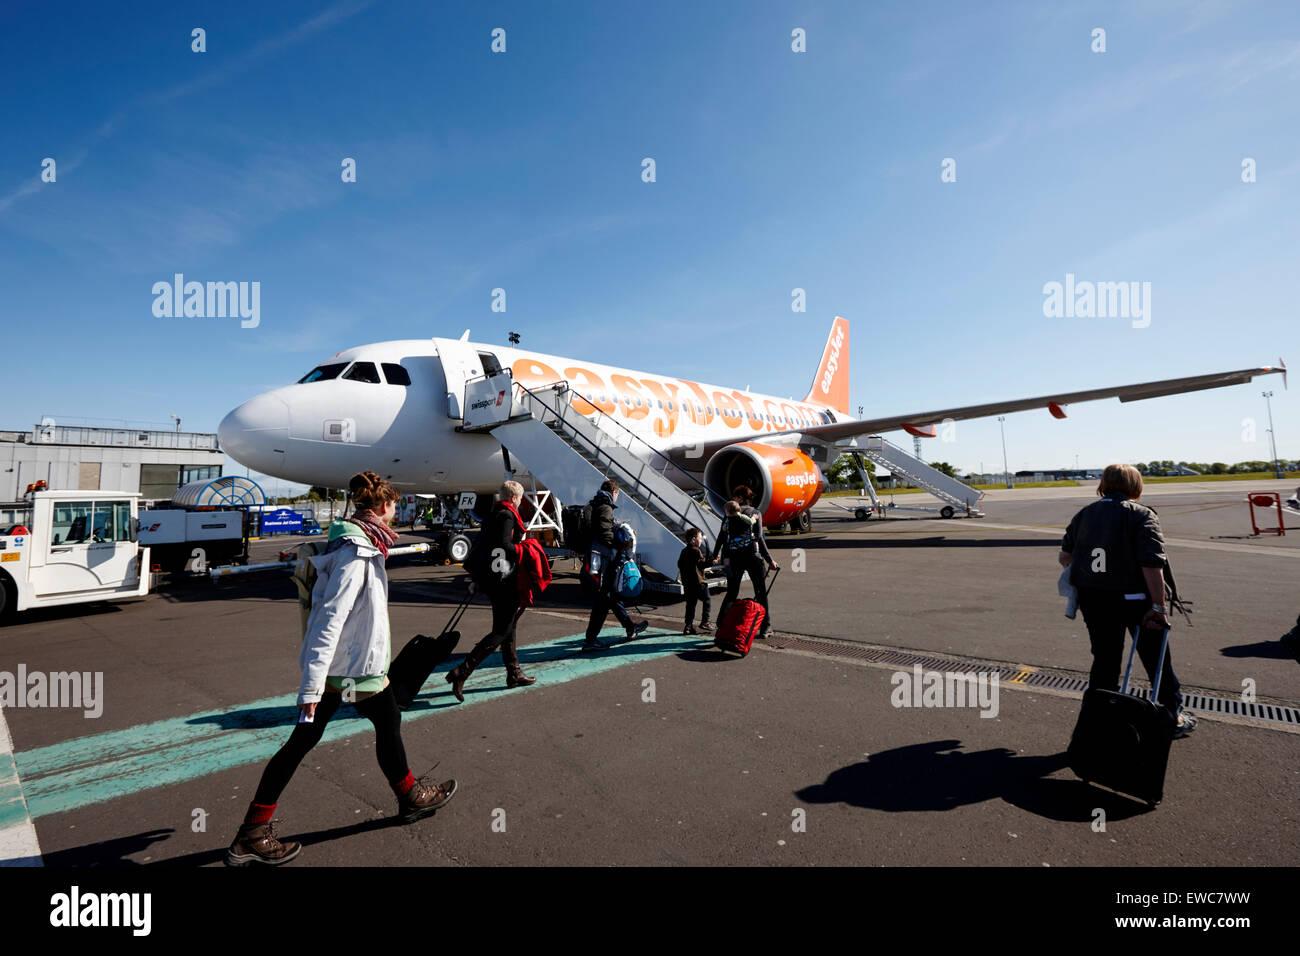 passengers boarding an easyjet aircraft at Belfast International Airport UK - Stock Image